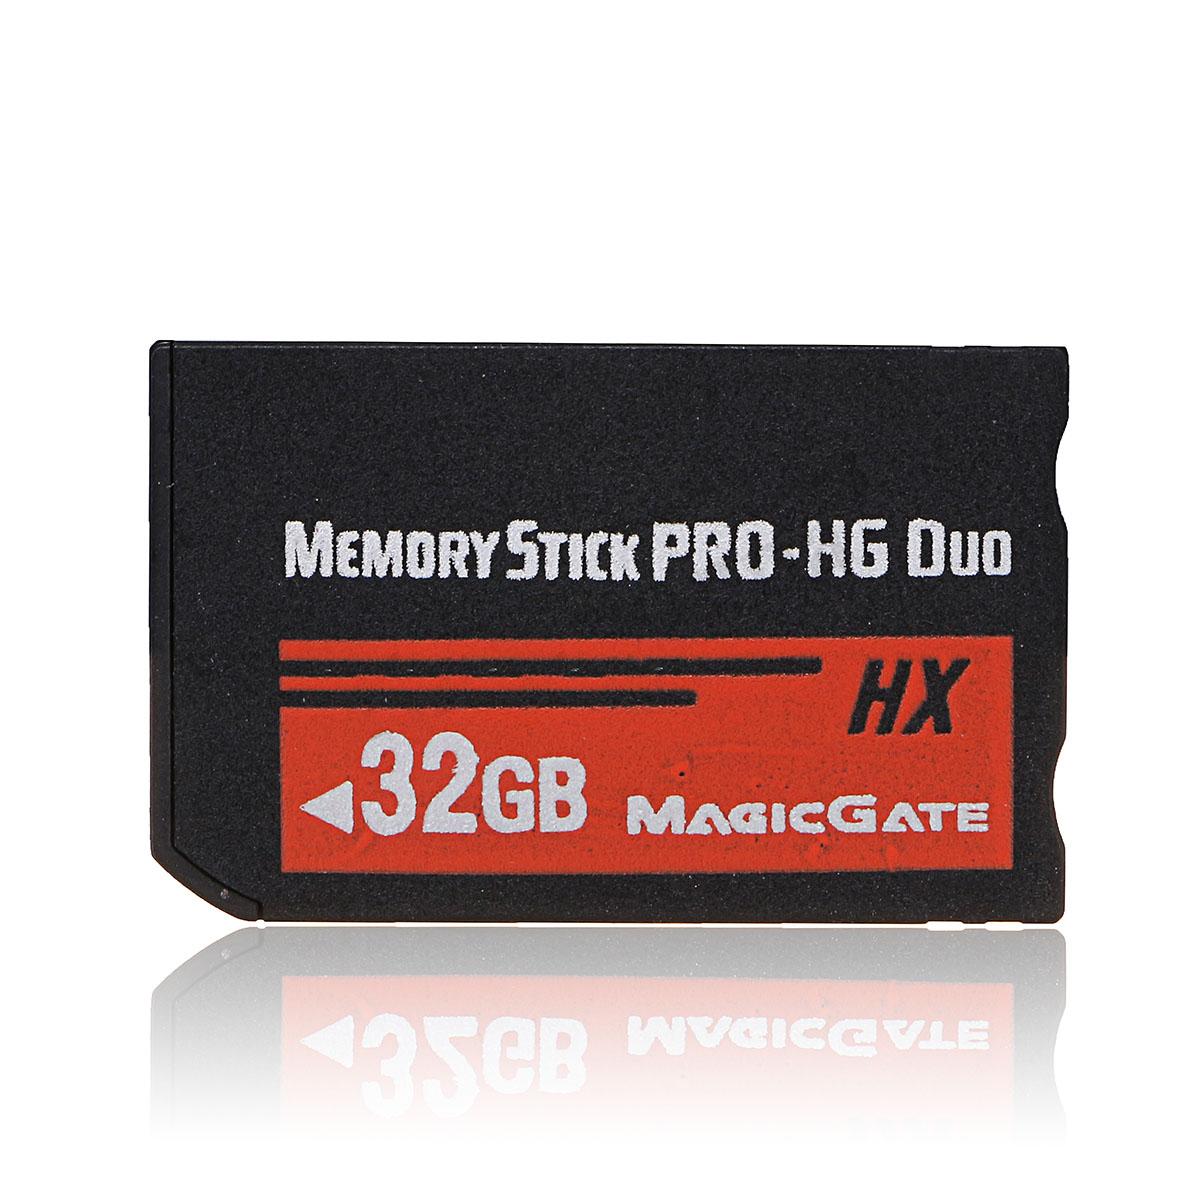 Memory Stick MS Pro Duo HX Flash Card For Sony PSP Cybershot Camera